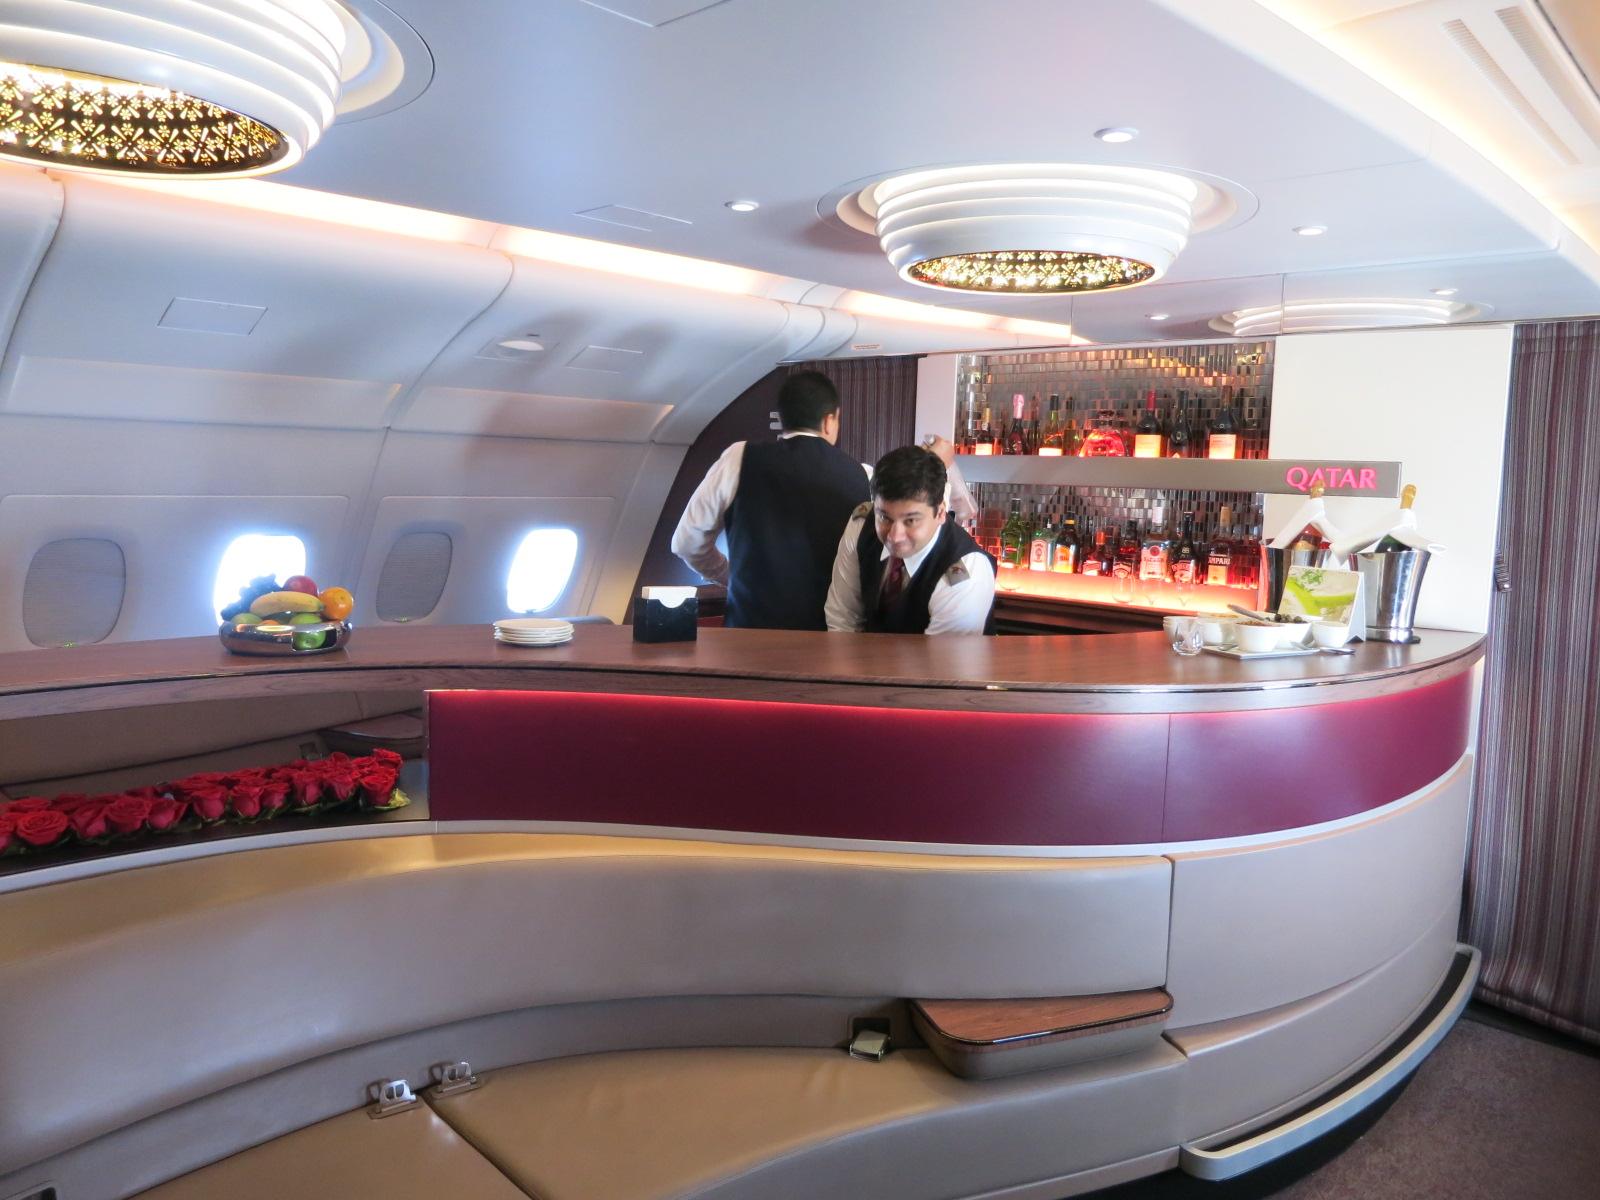 Qatar Airways A380 first class bar Bangkok-Doha